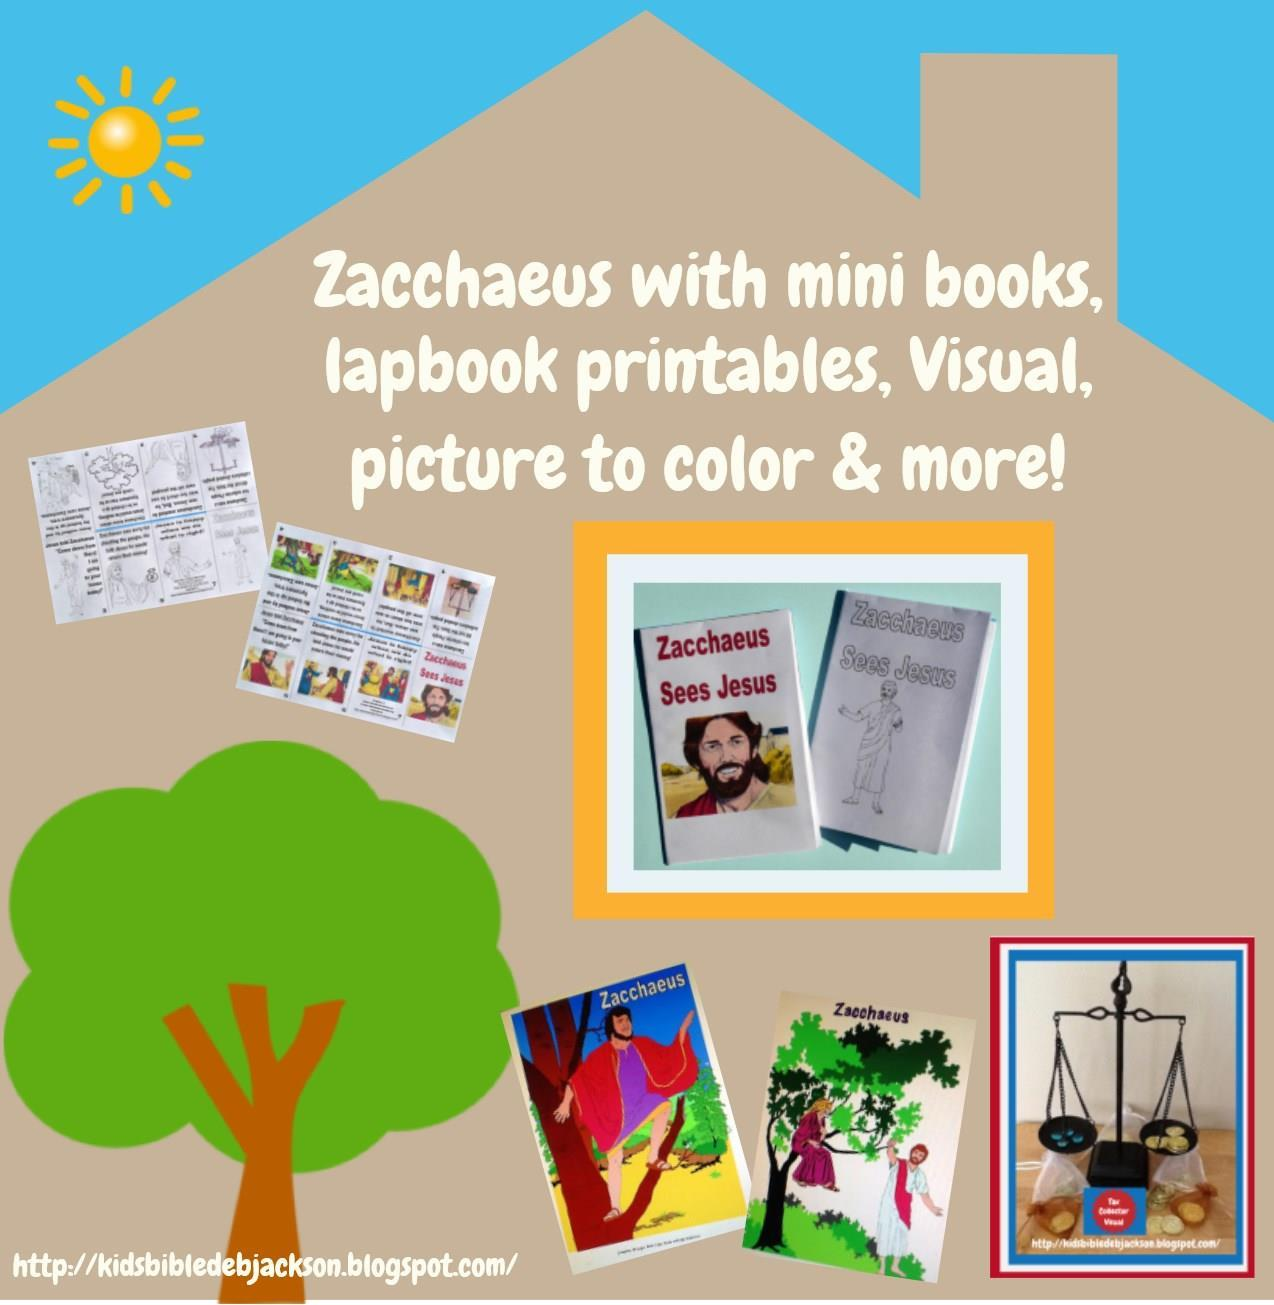 Kids bible deb jackson blog myideasbedroom com